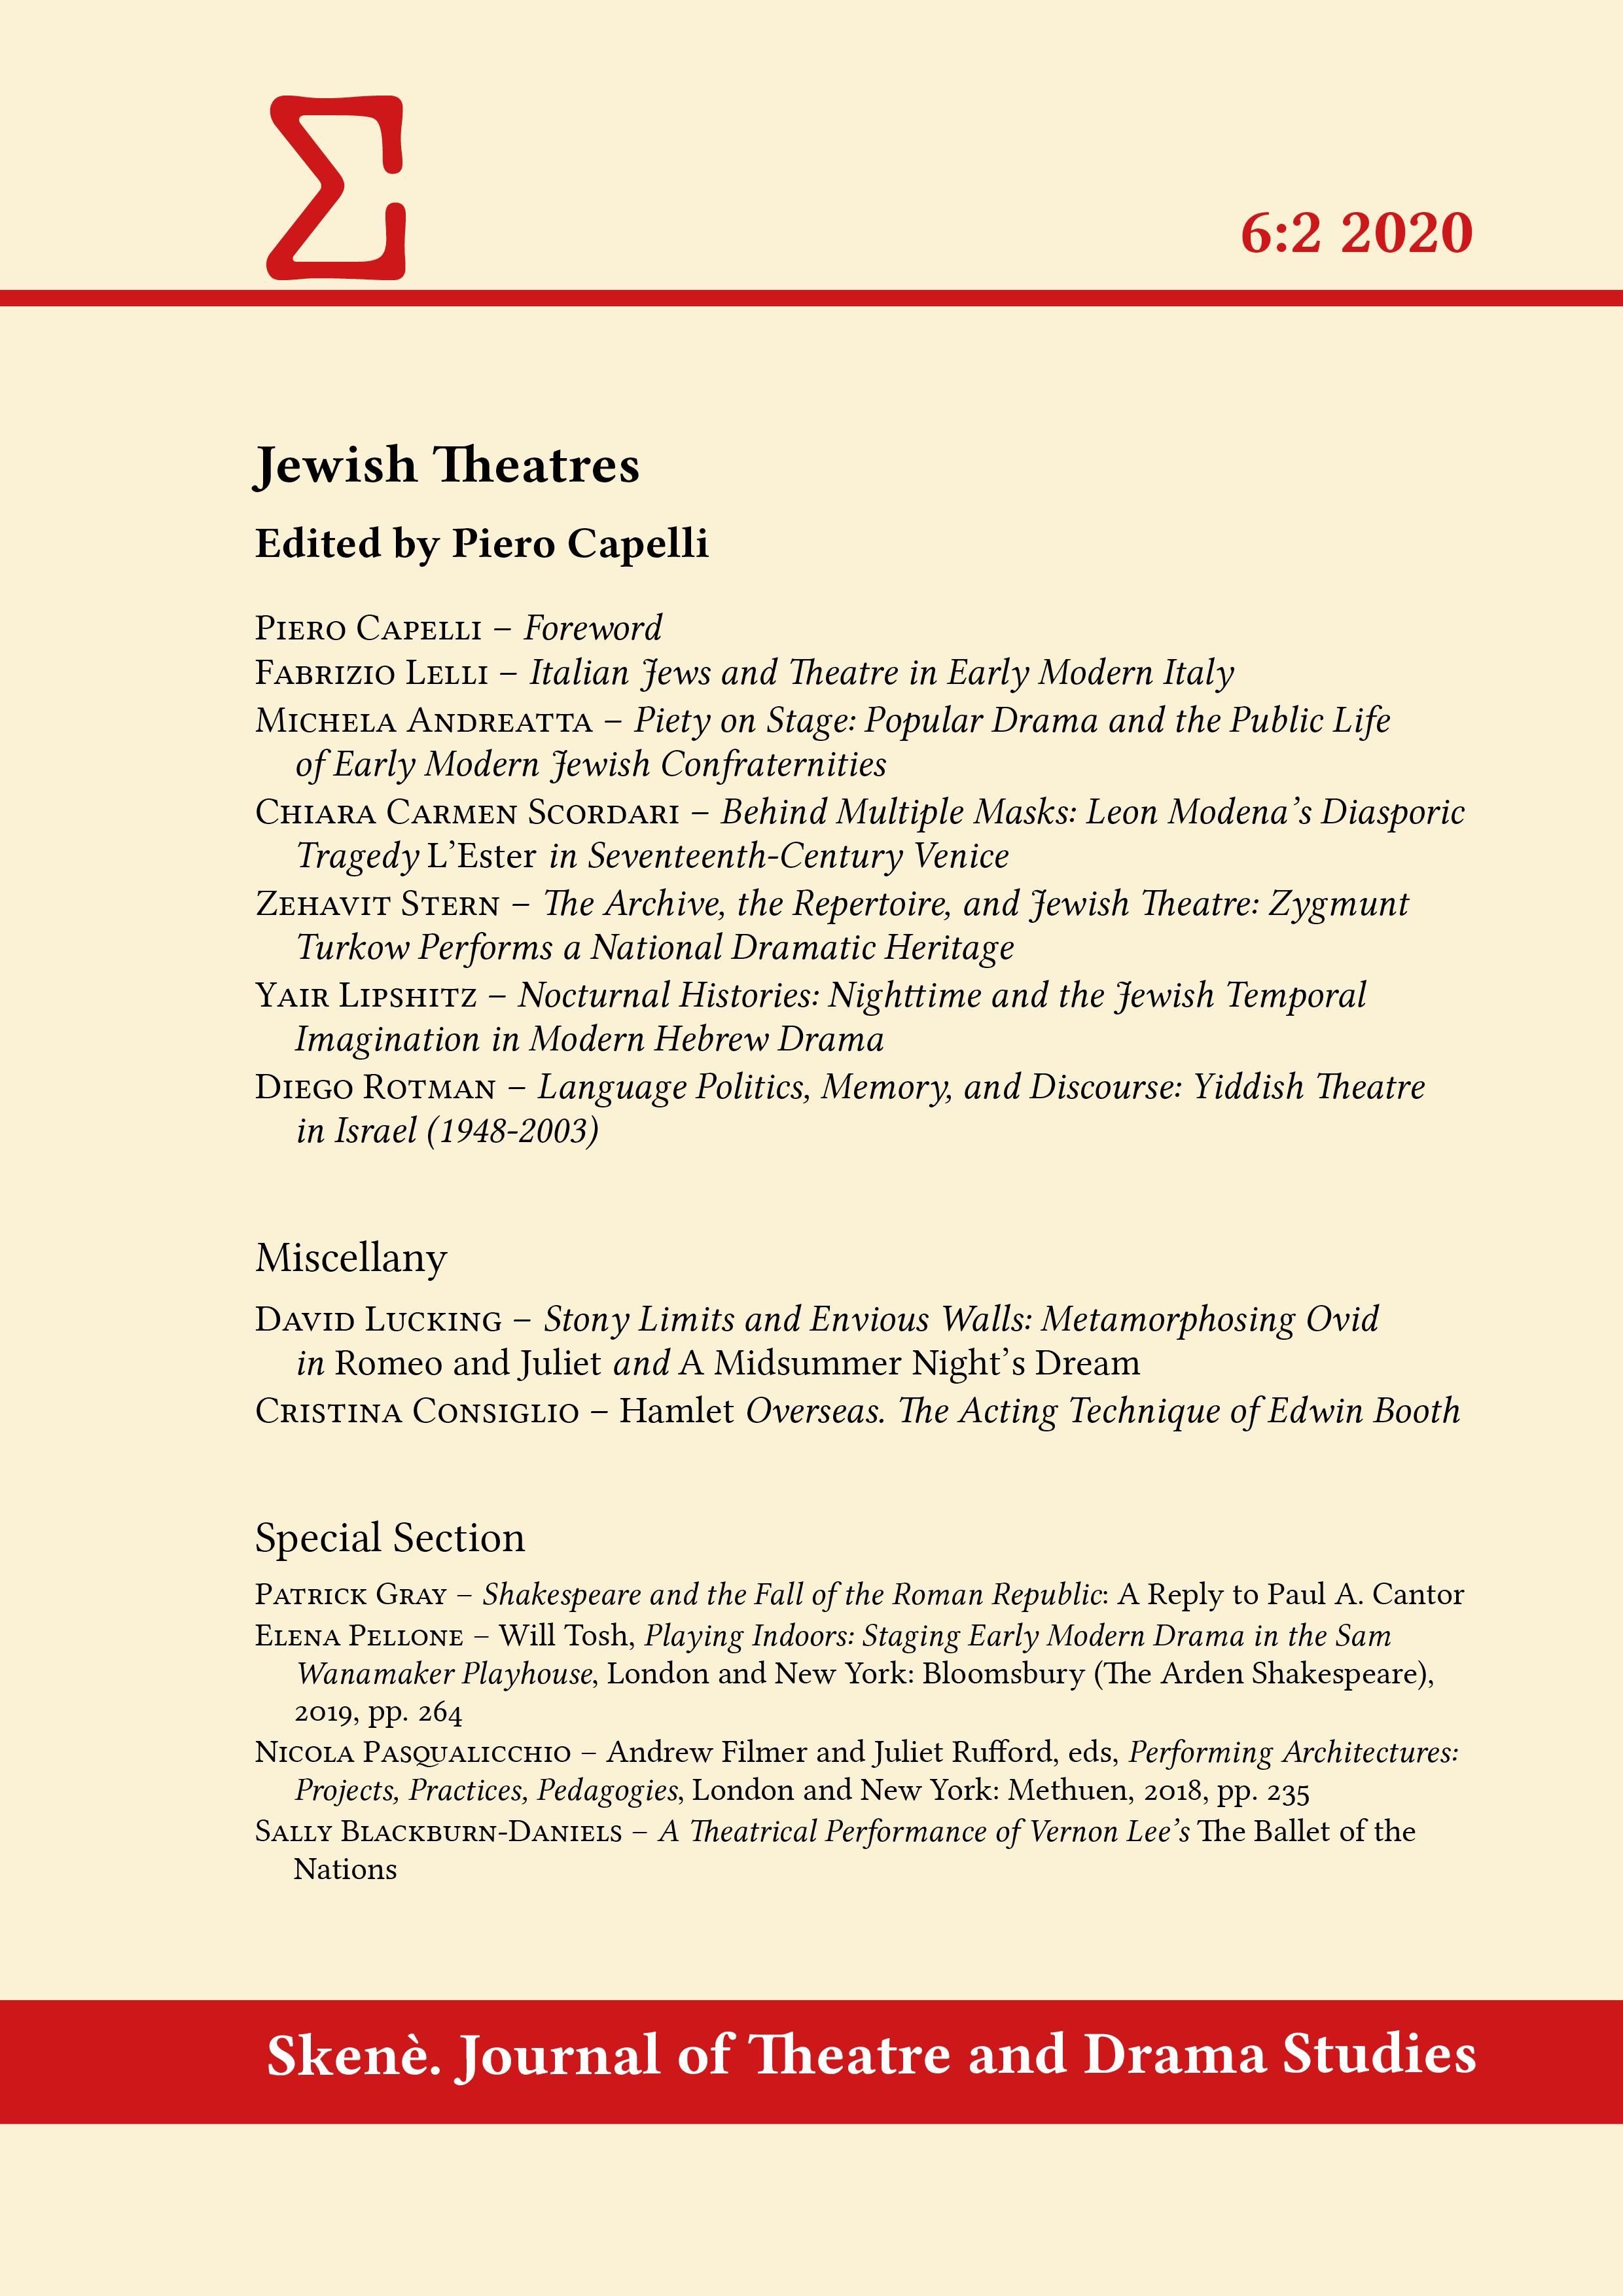 View Vol. 6 No. 2 (2020): Jewish Theatres